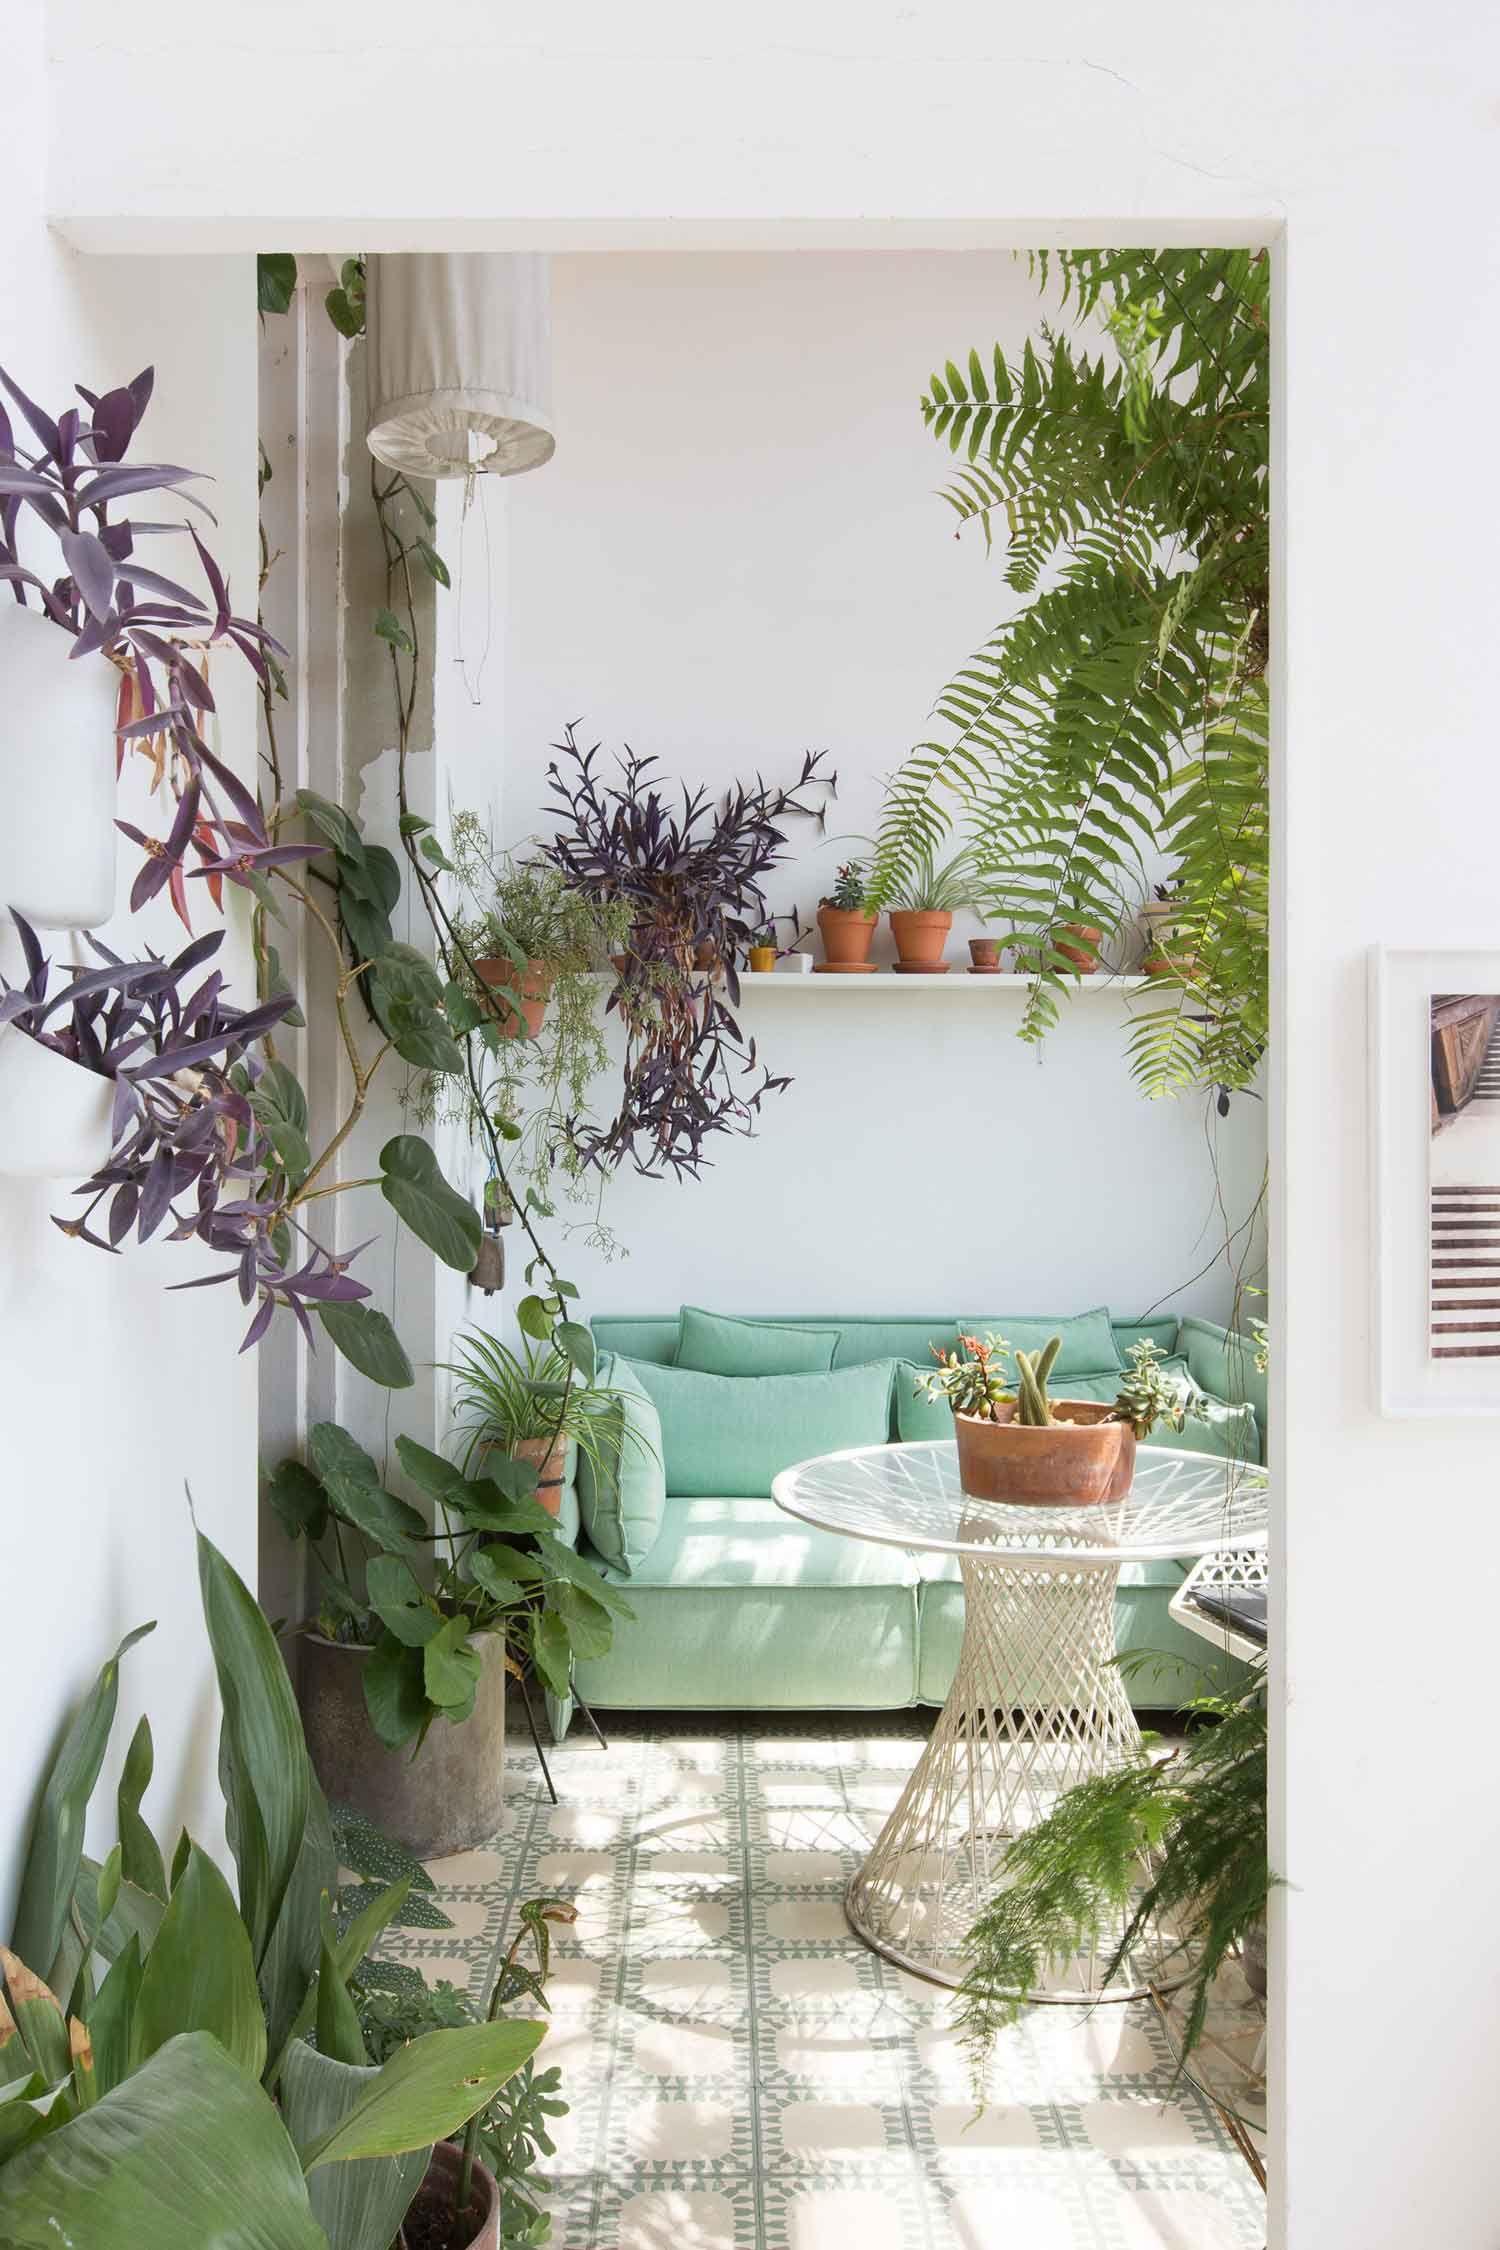 greenterior creatives interior and their love for plants gardens rh pinterest com